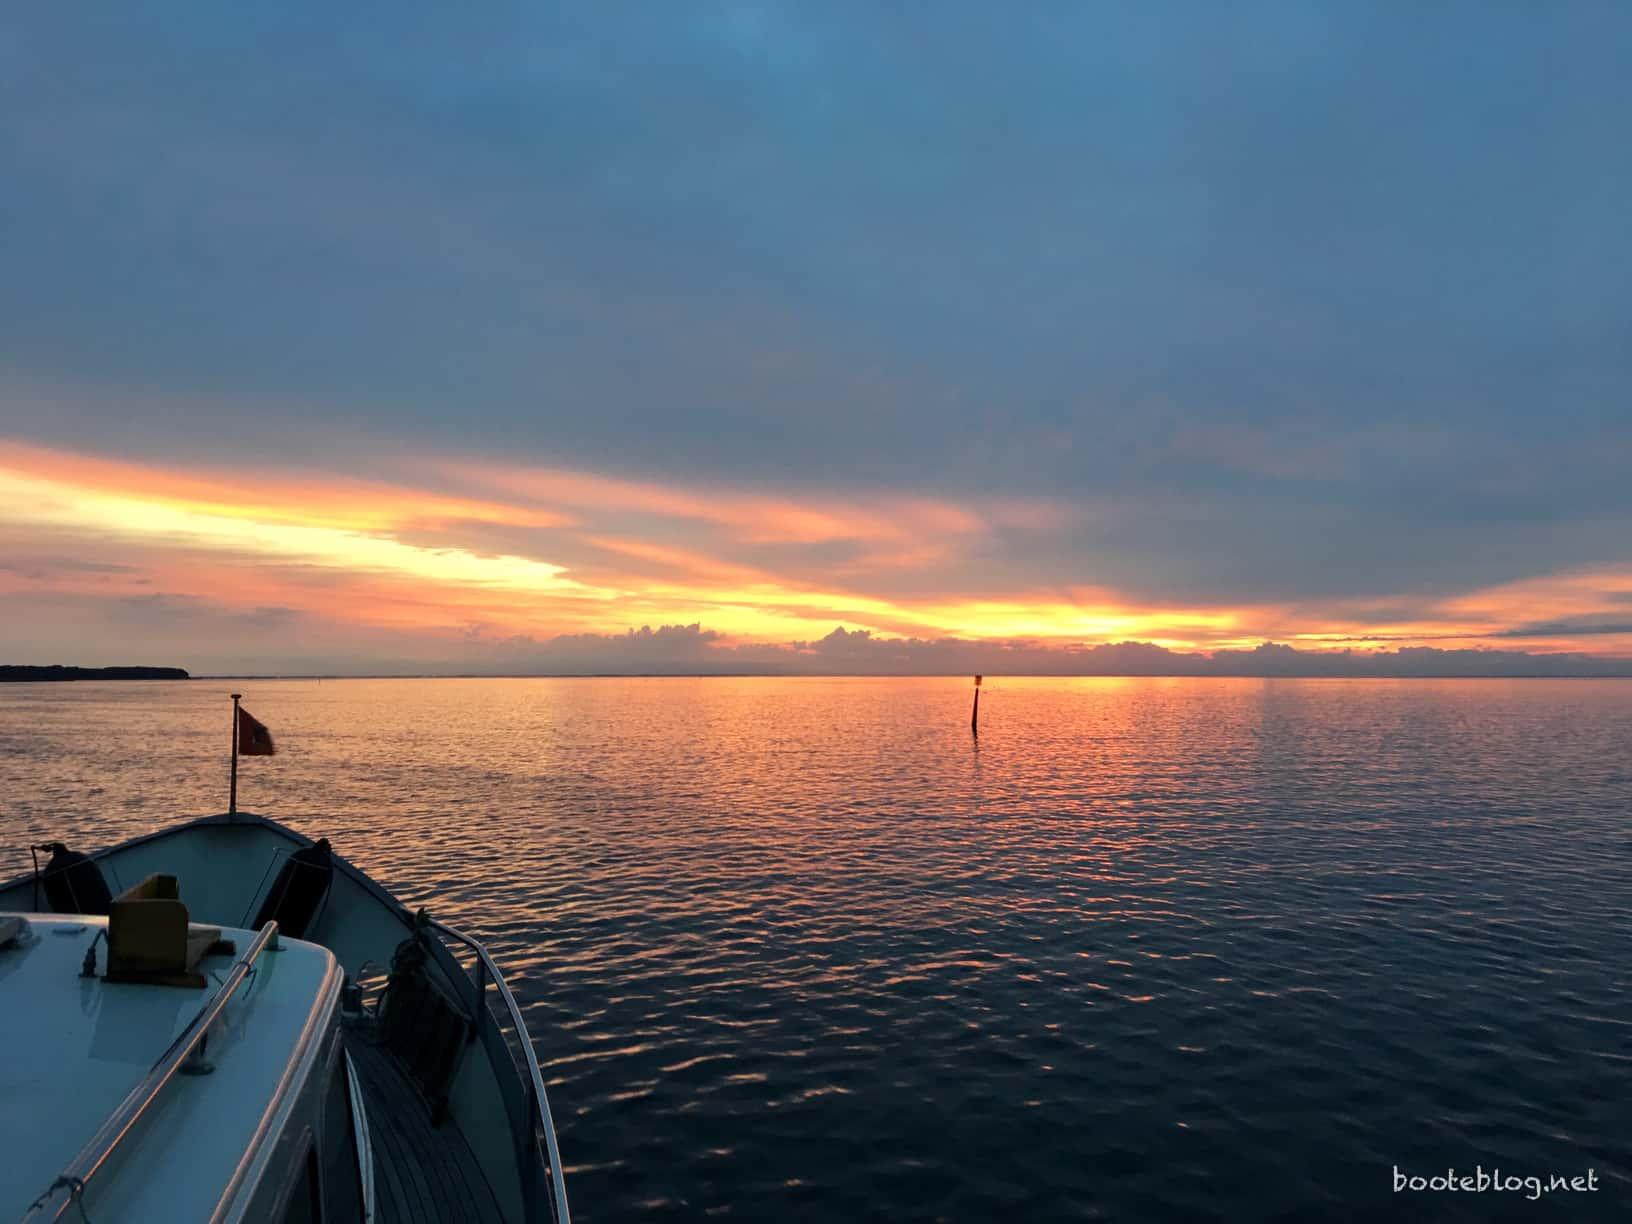 Schöner Sonnenaufgang um kurz nach fünf Uhr am Anfang der Faxe Bugt.